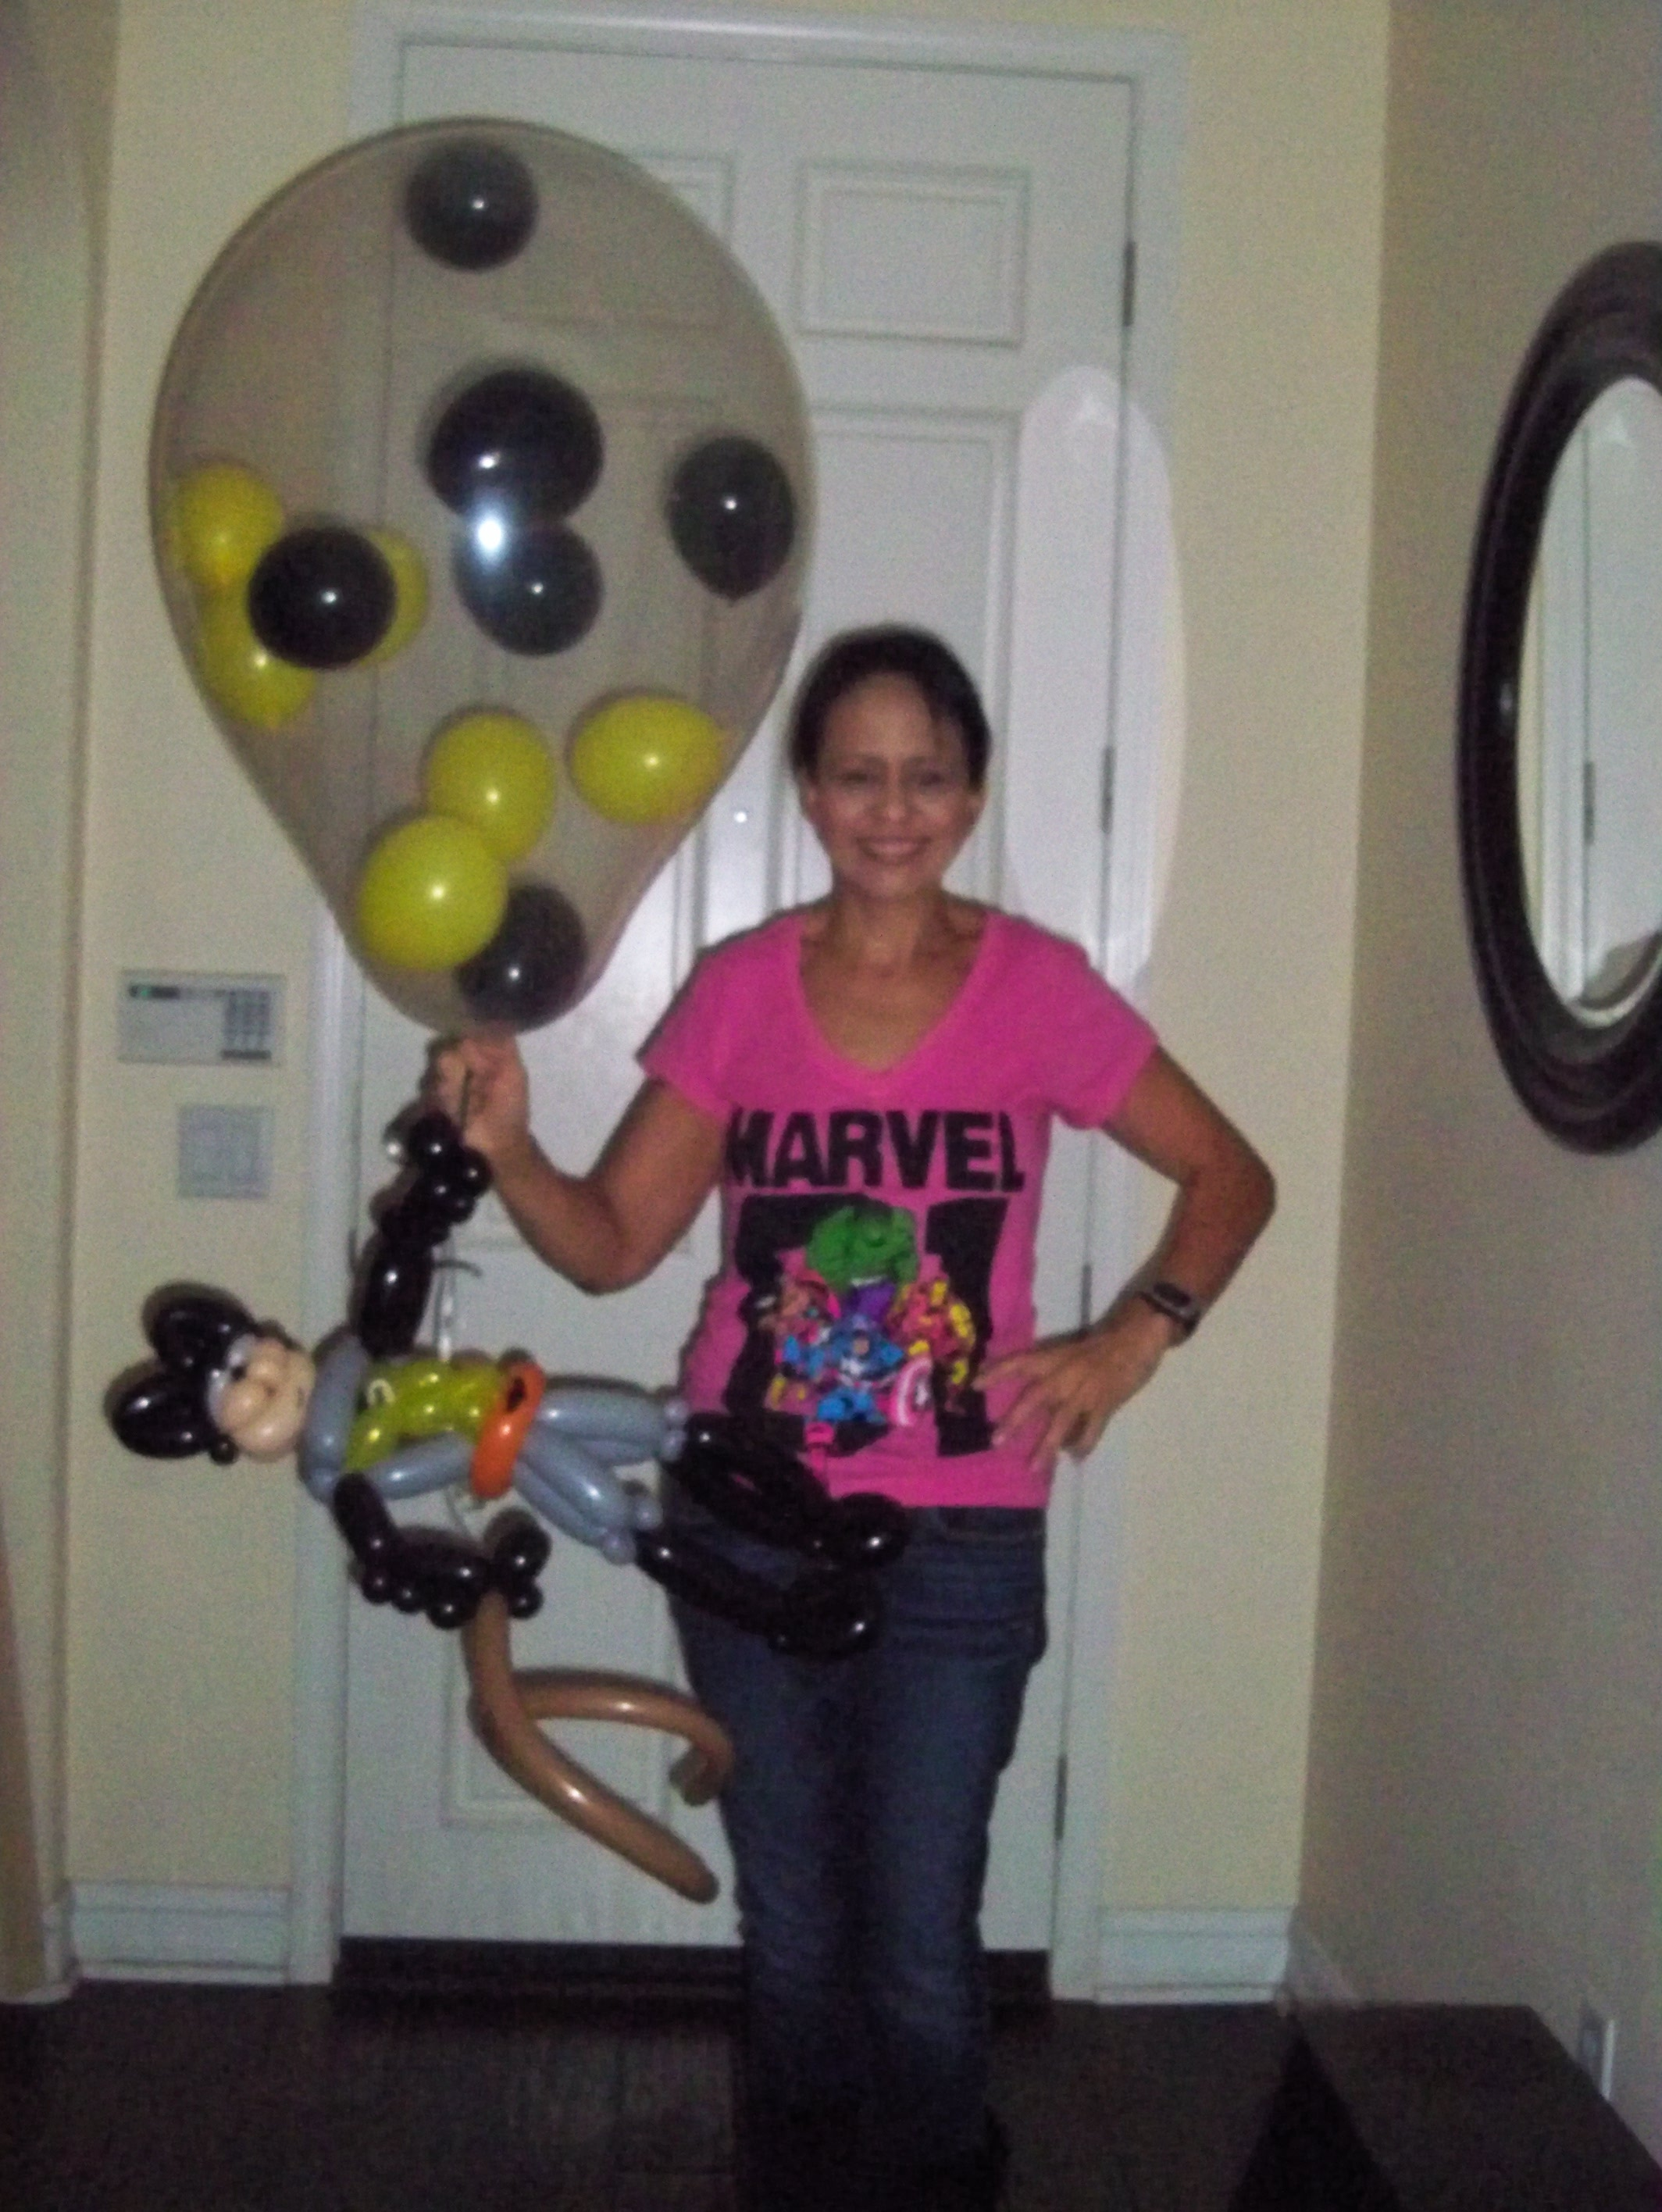 Batman figure and stuffed balloon